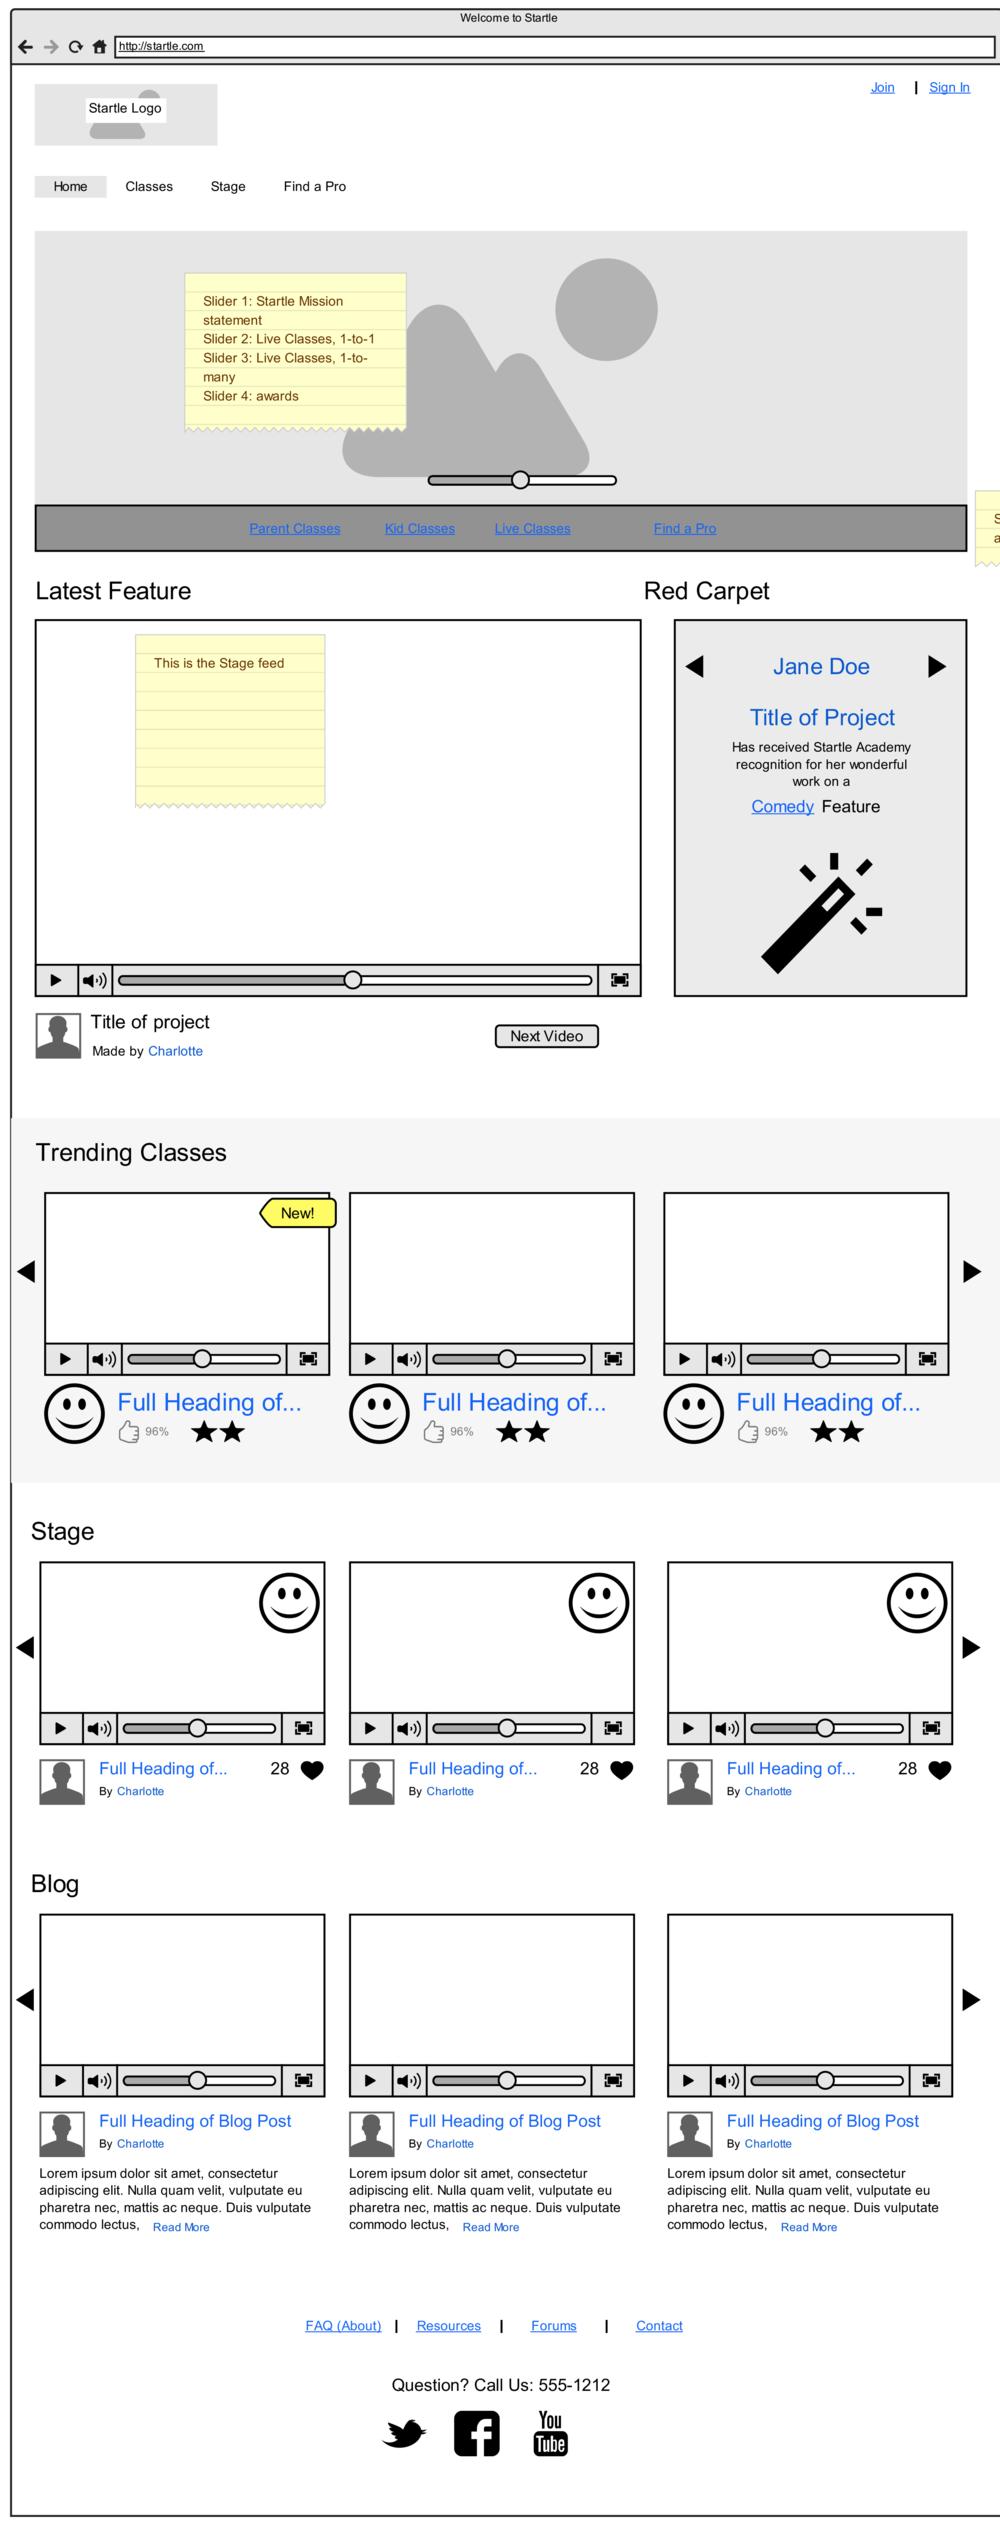 Mid-fidelity interactive wireframe prototype (Moqups)